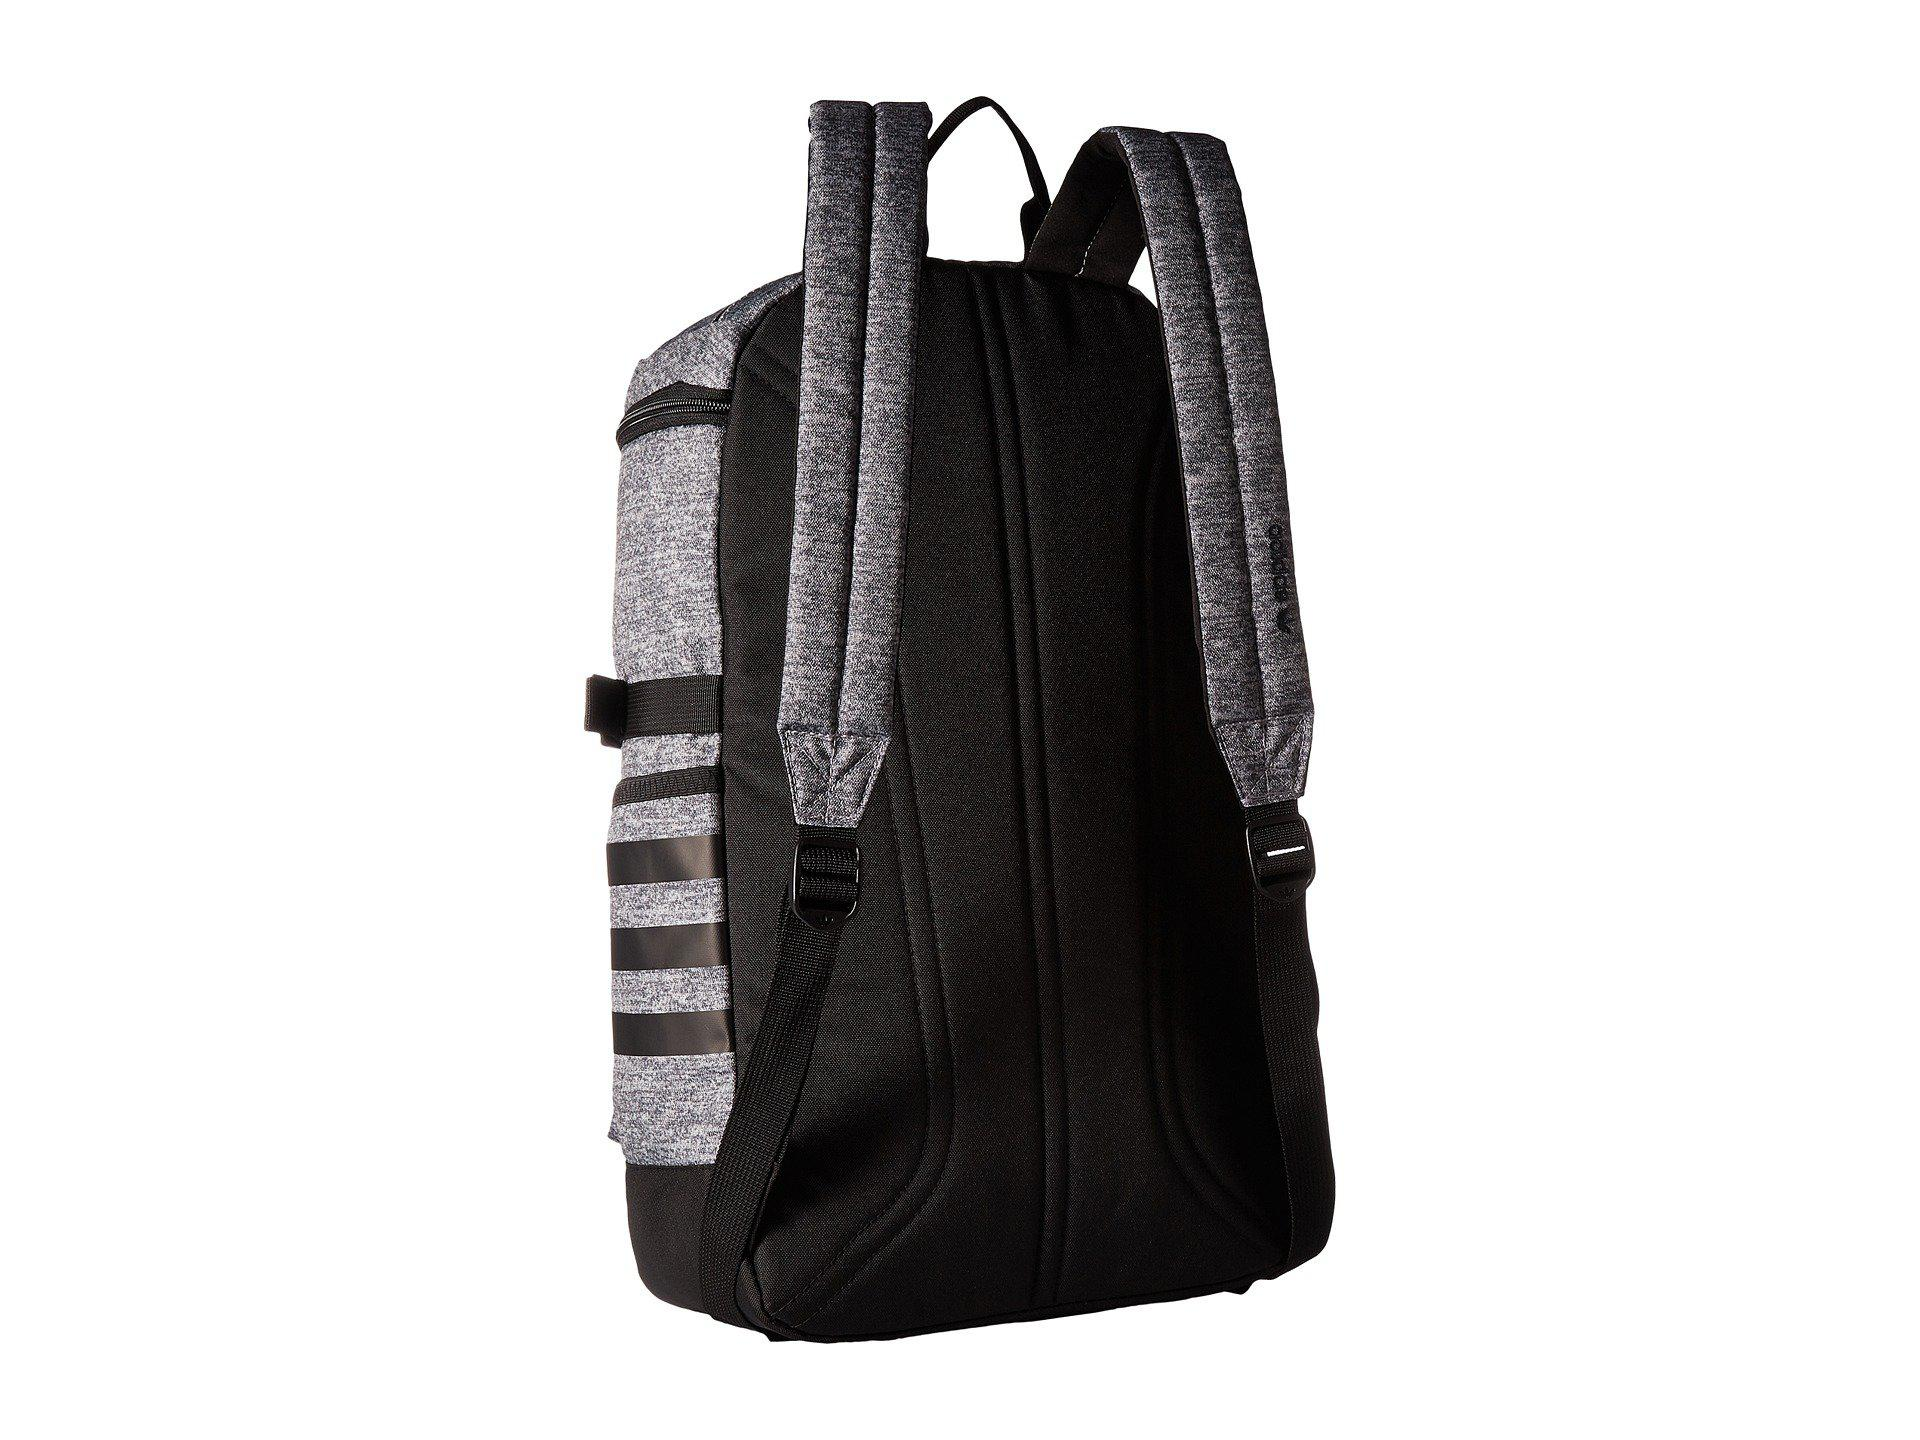 d8cfe4f00599 Lyst - adidas Originals National Zip Top Backpack (jersey Onix black ...